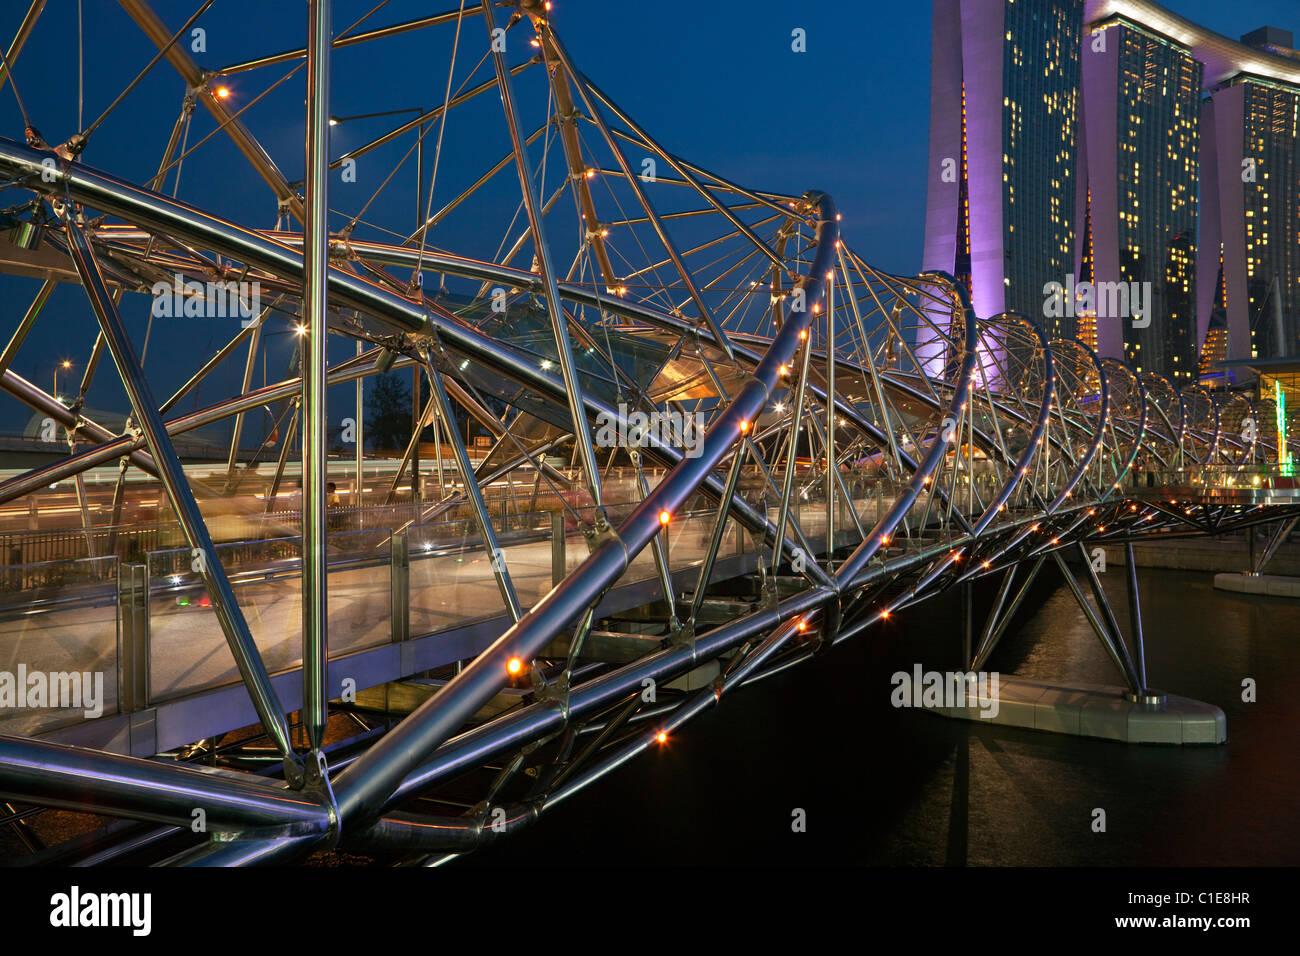 The Helix Bridge - connecting the Marina Bay Sands Hotel with Marina Central.   Marina Bay, Singapore - Stock Image